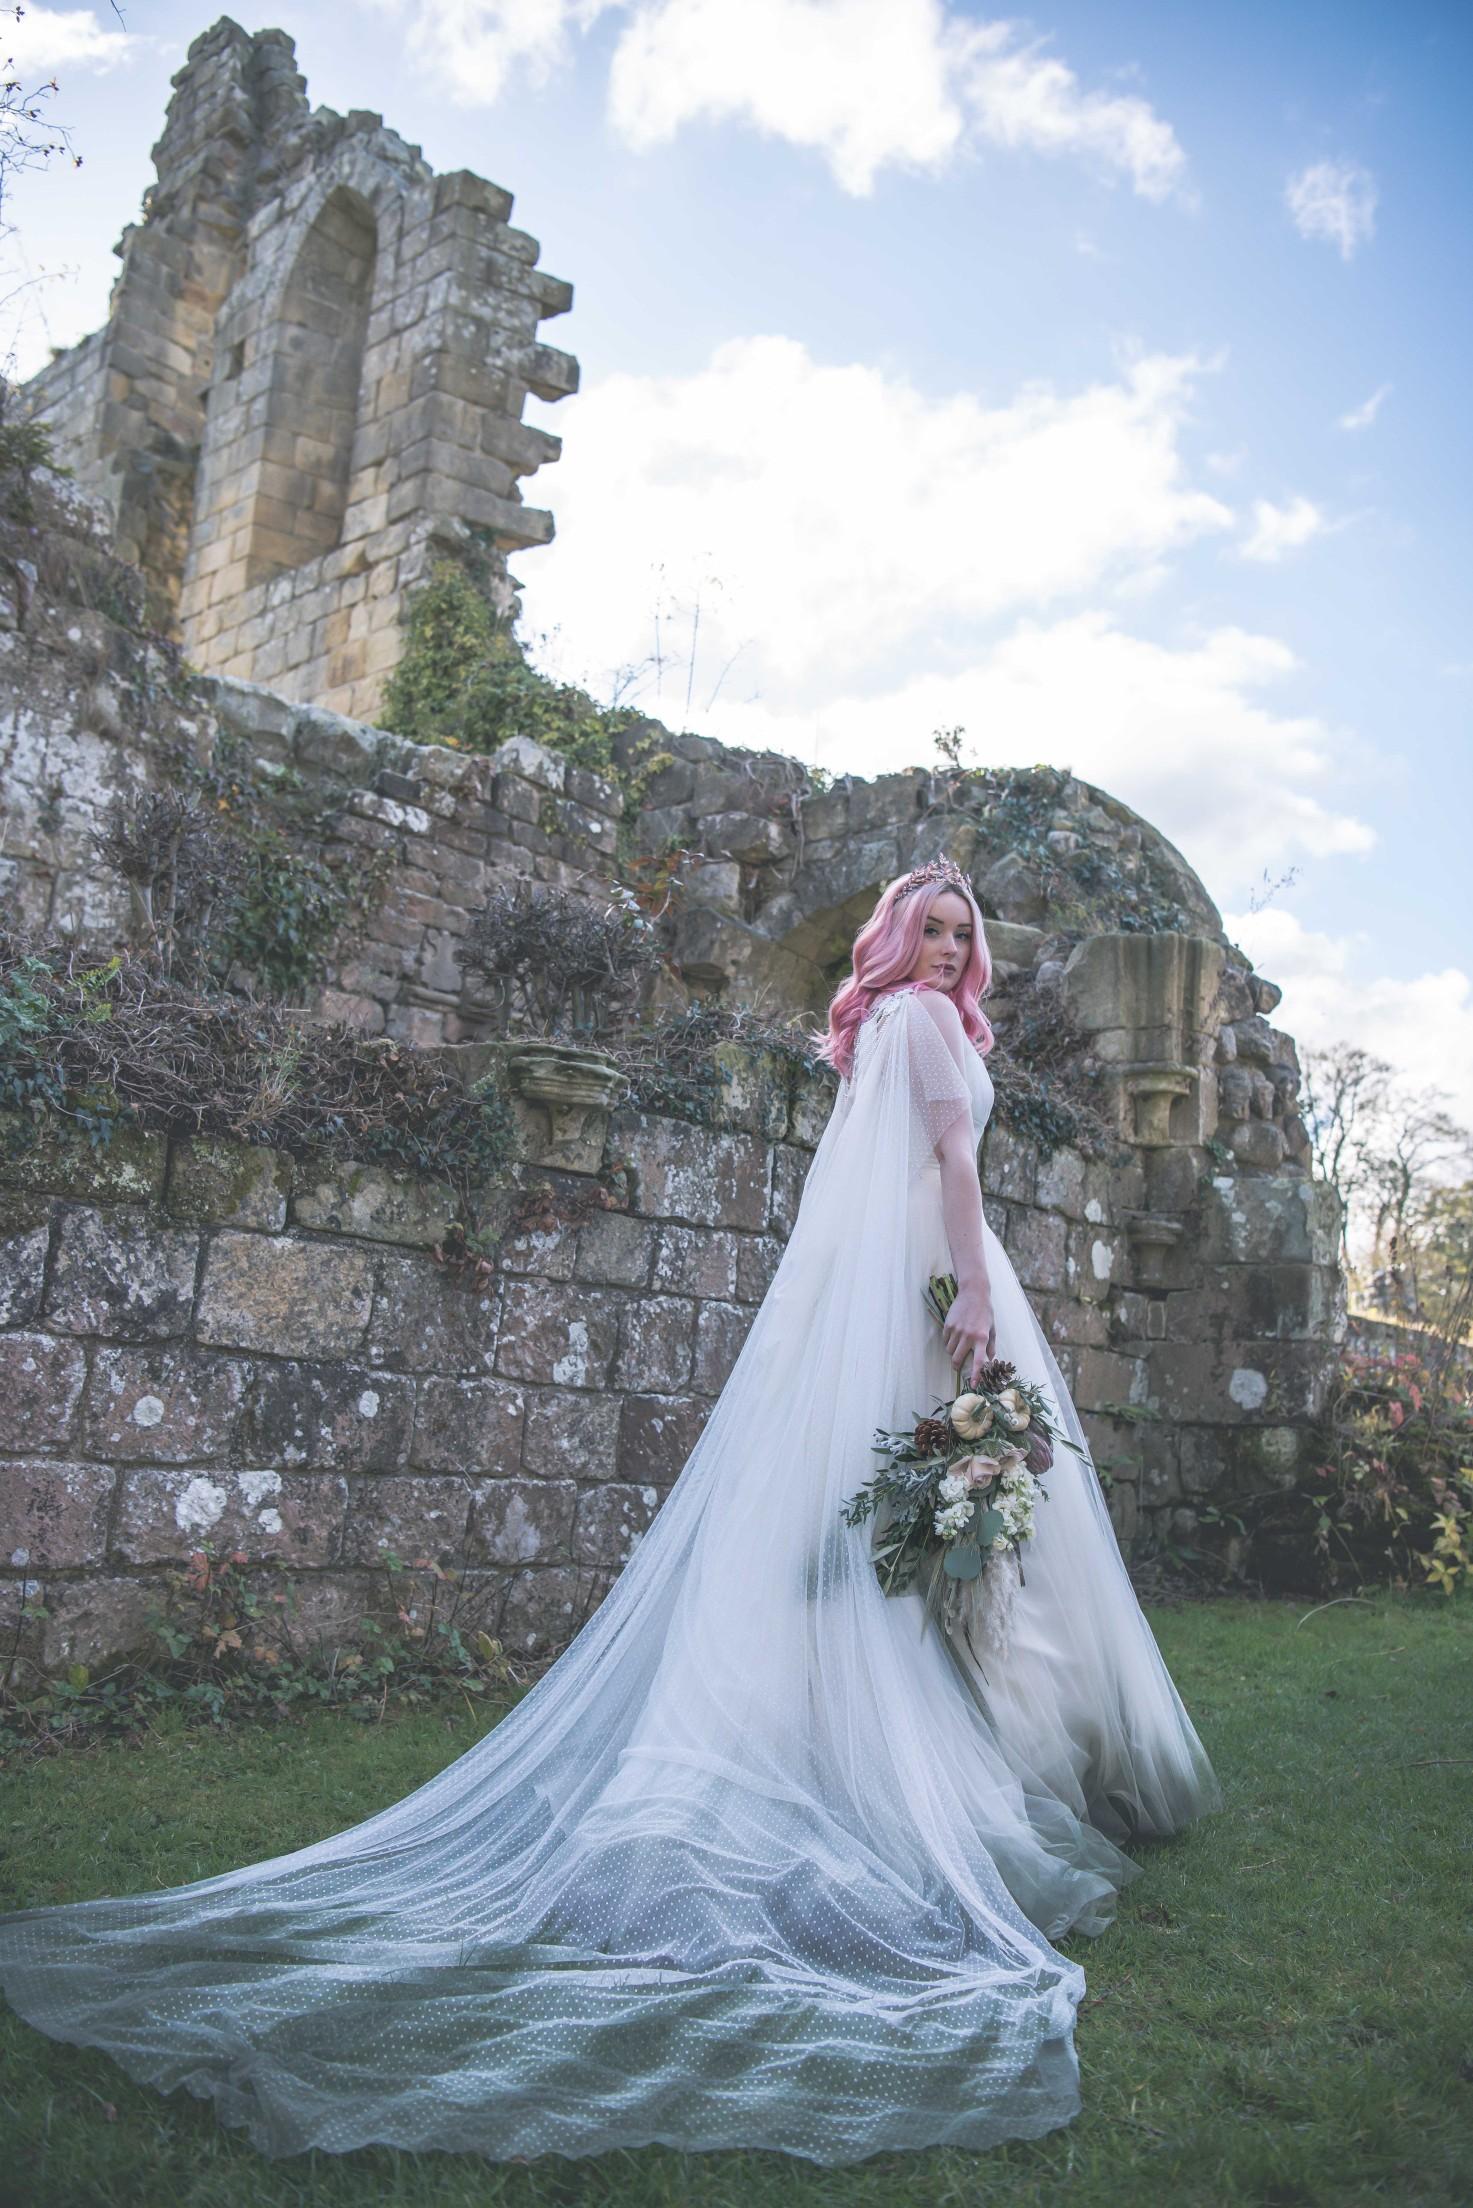 Live your own fairytale wedding - BexBrides - Jervaulx-0009 [9544] (1)